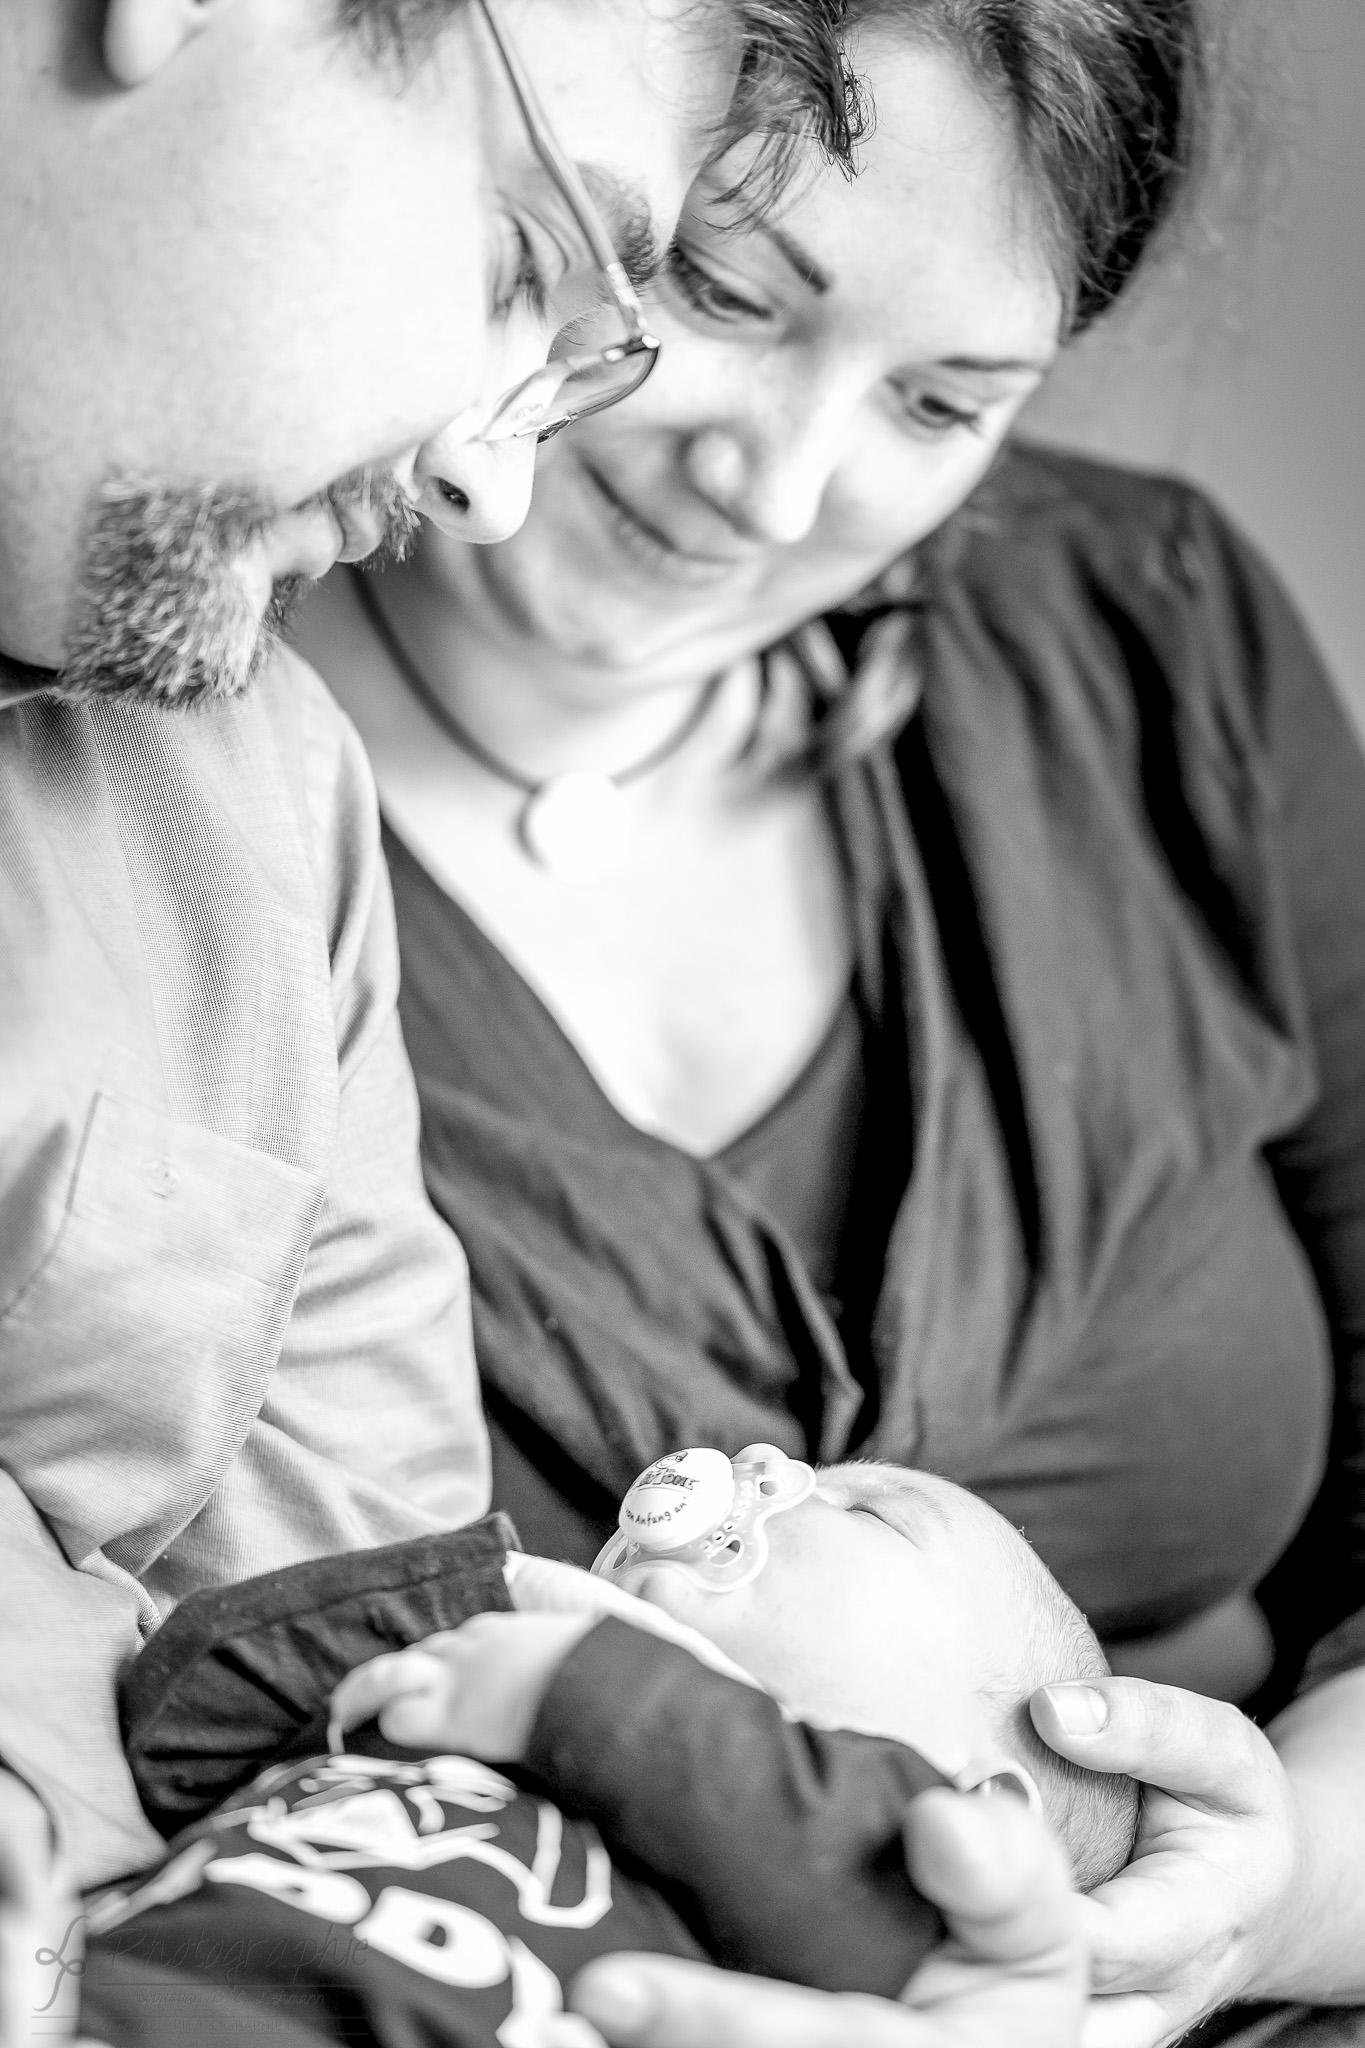 Familienfotograf - Neugeborenenfotografie